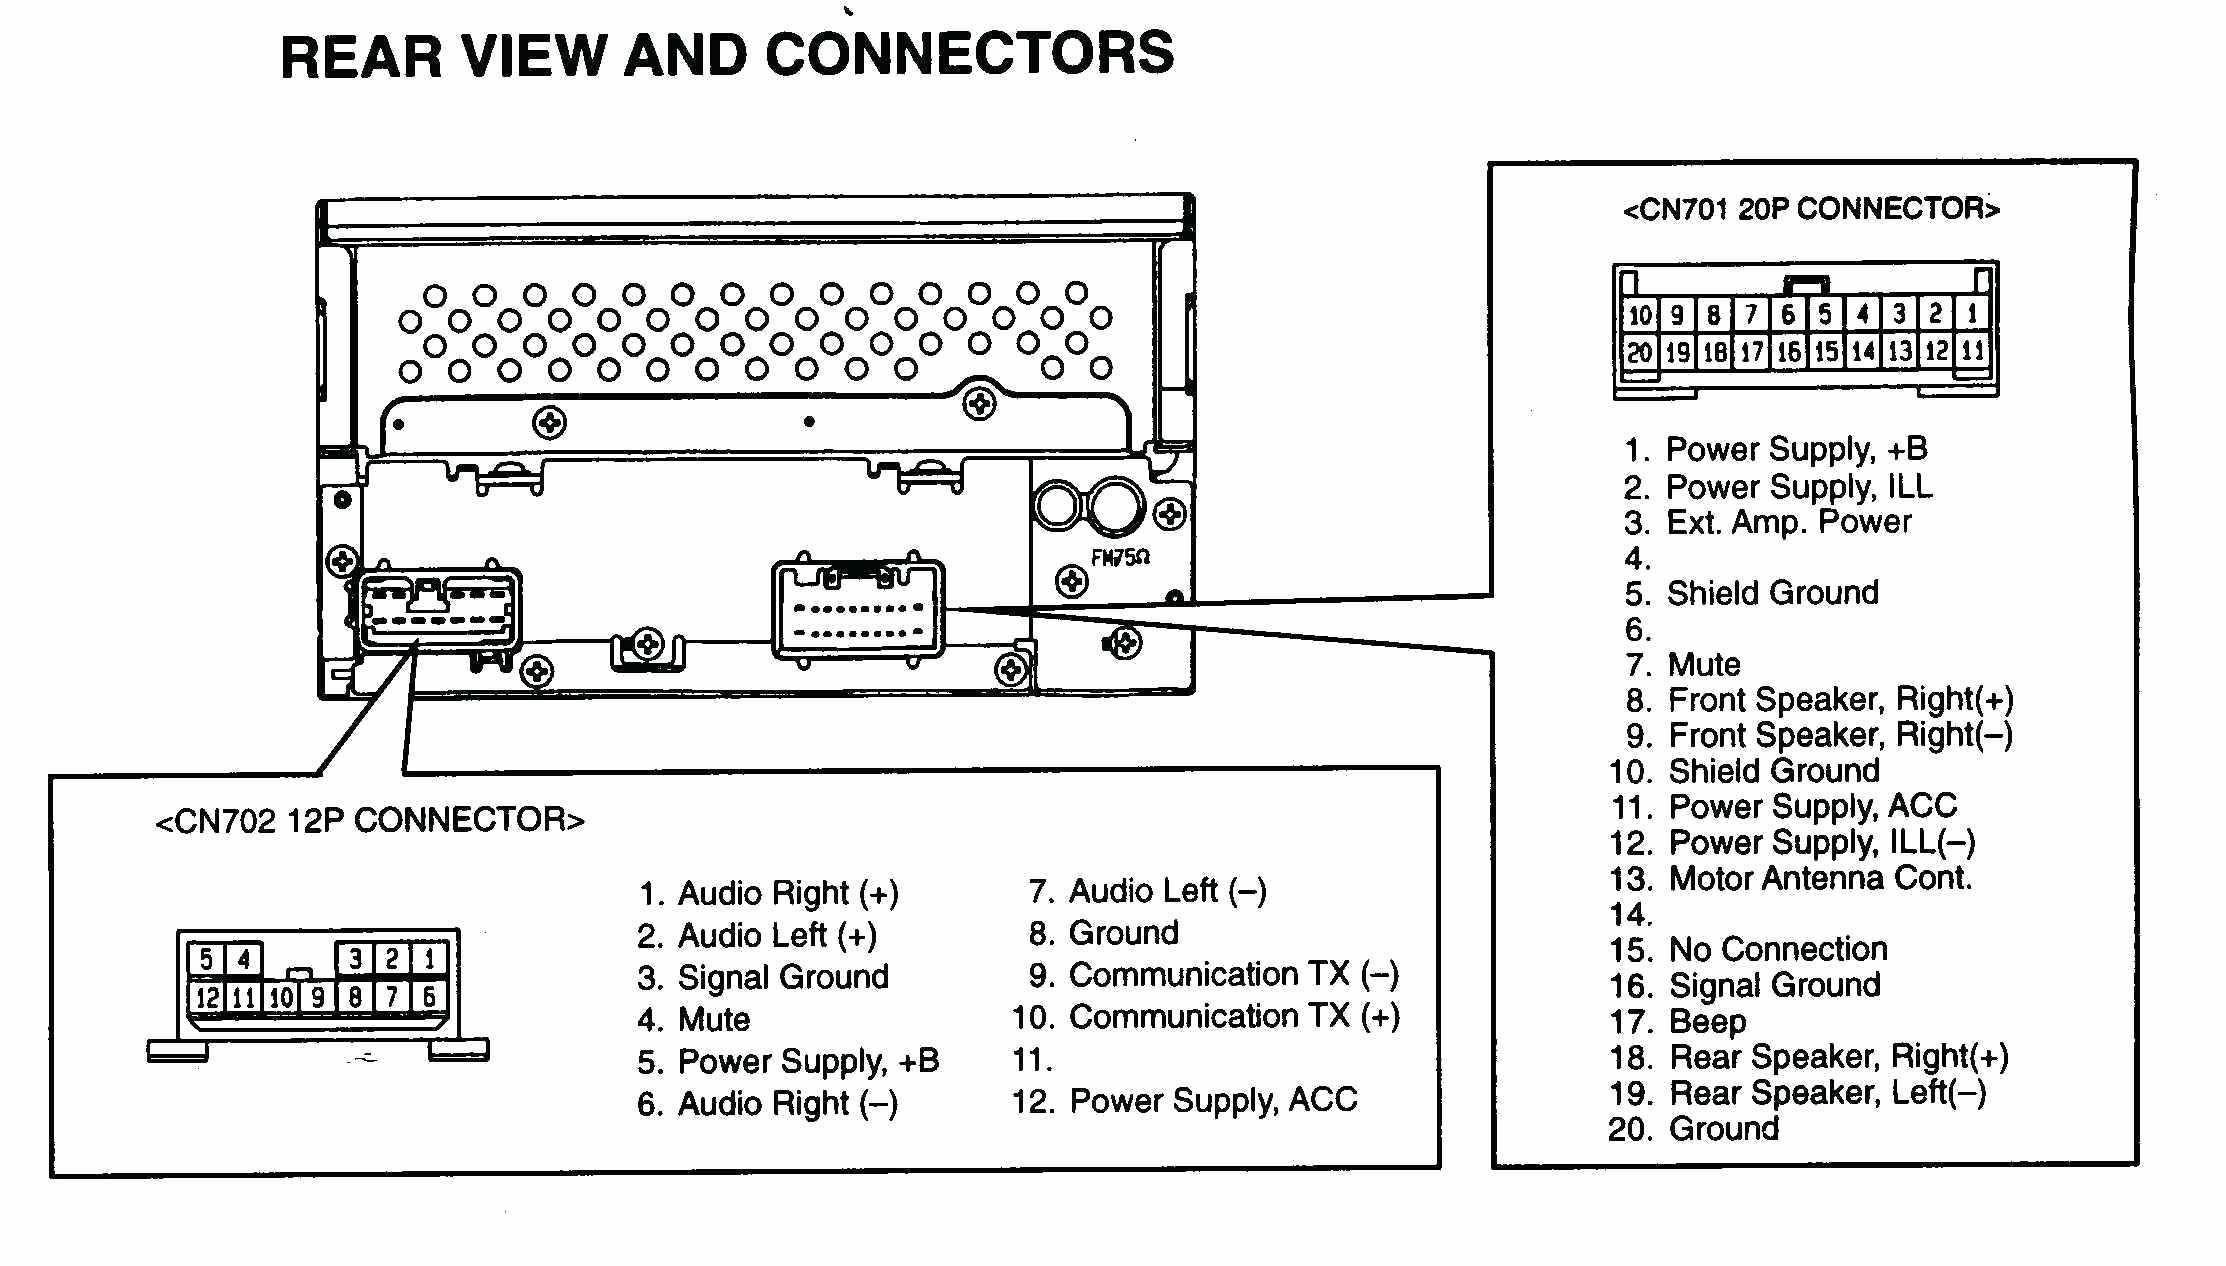 bose acoustimass 10 wiring diagram Download-Wiring Diagram for Bose Car Audio Fresh Audi A4 Bose Amp Wiring Diagram New Lovely Car 12-a